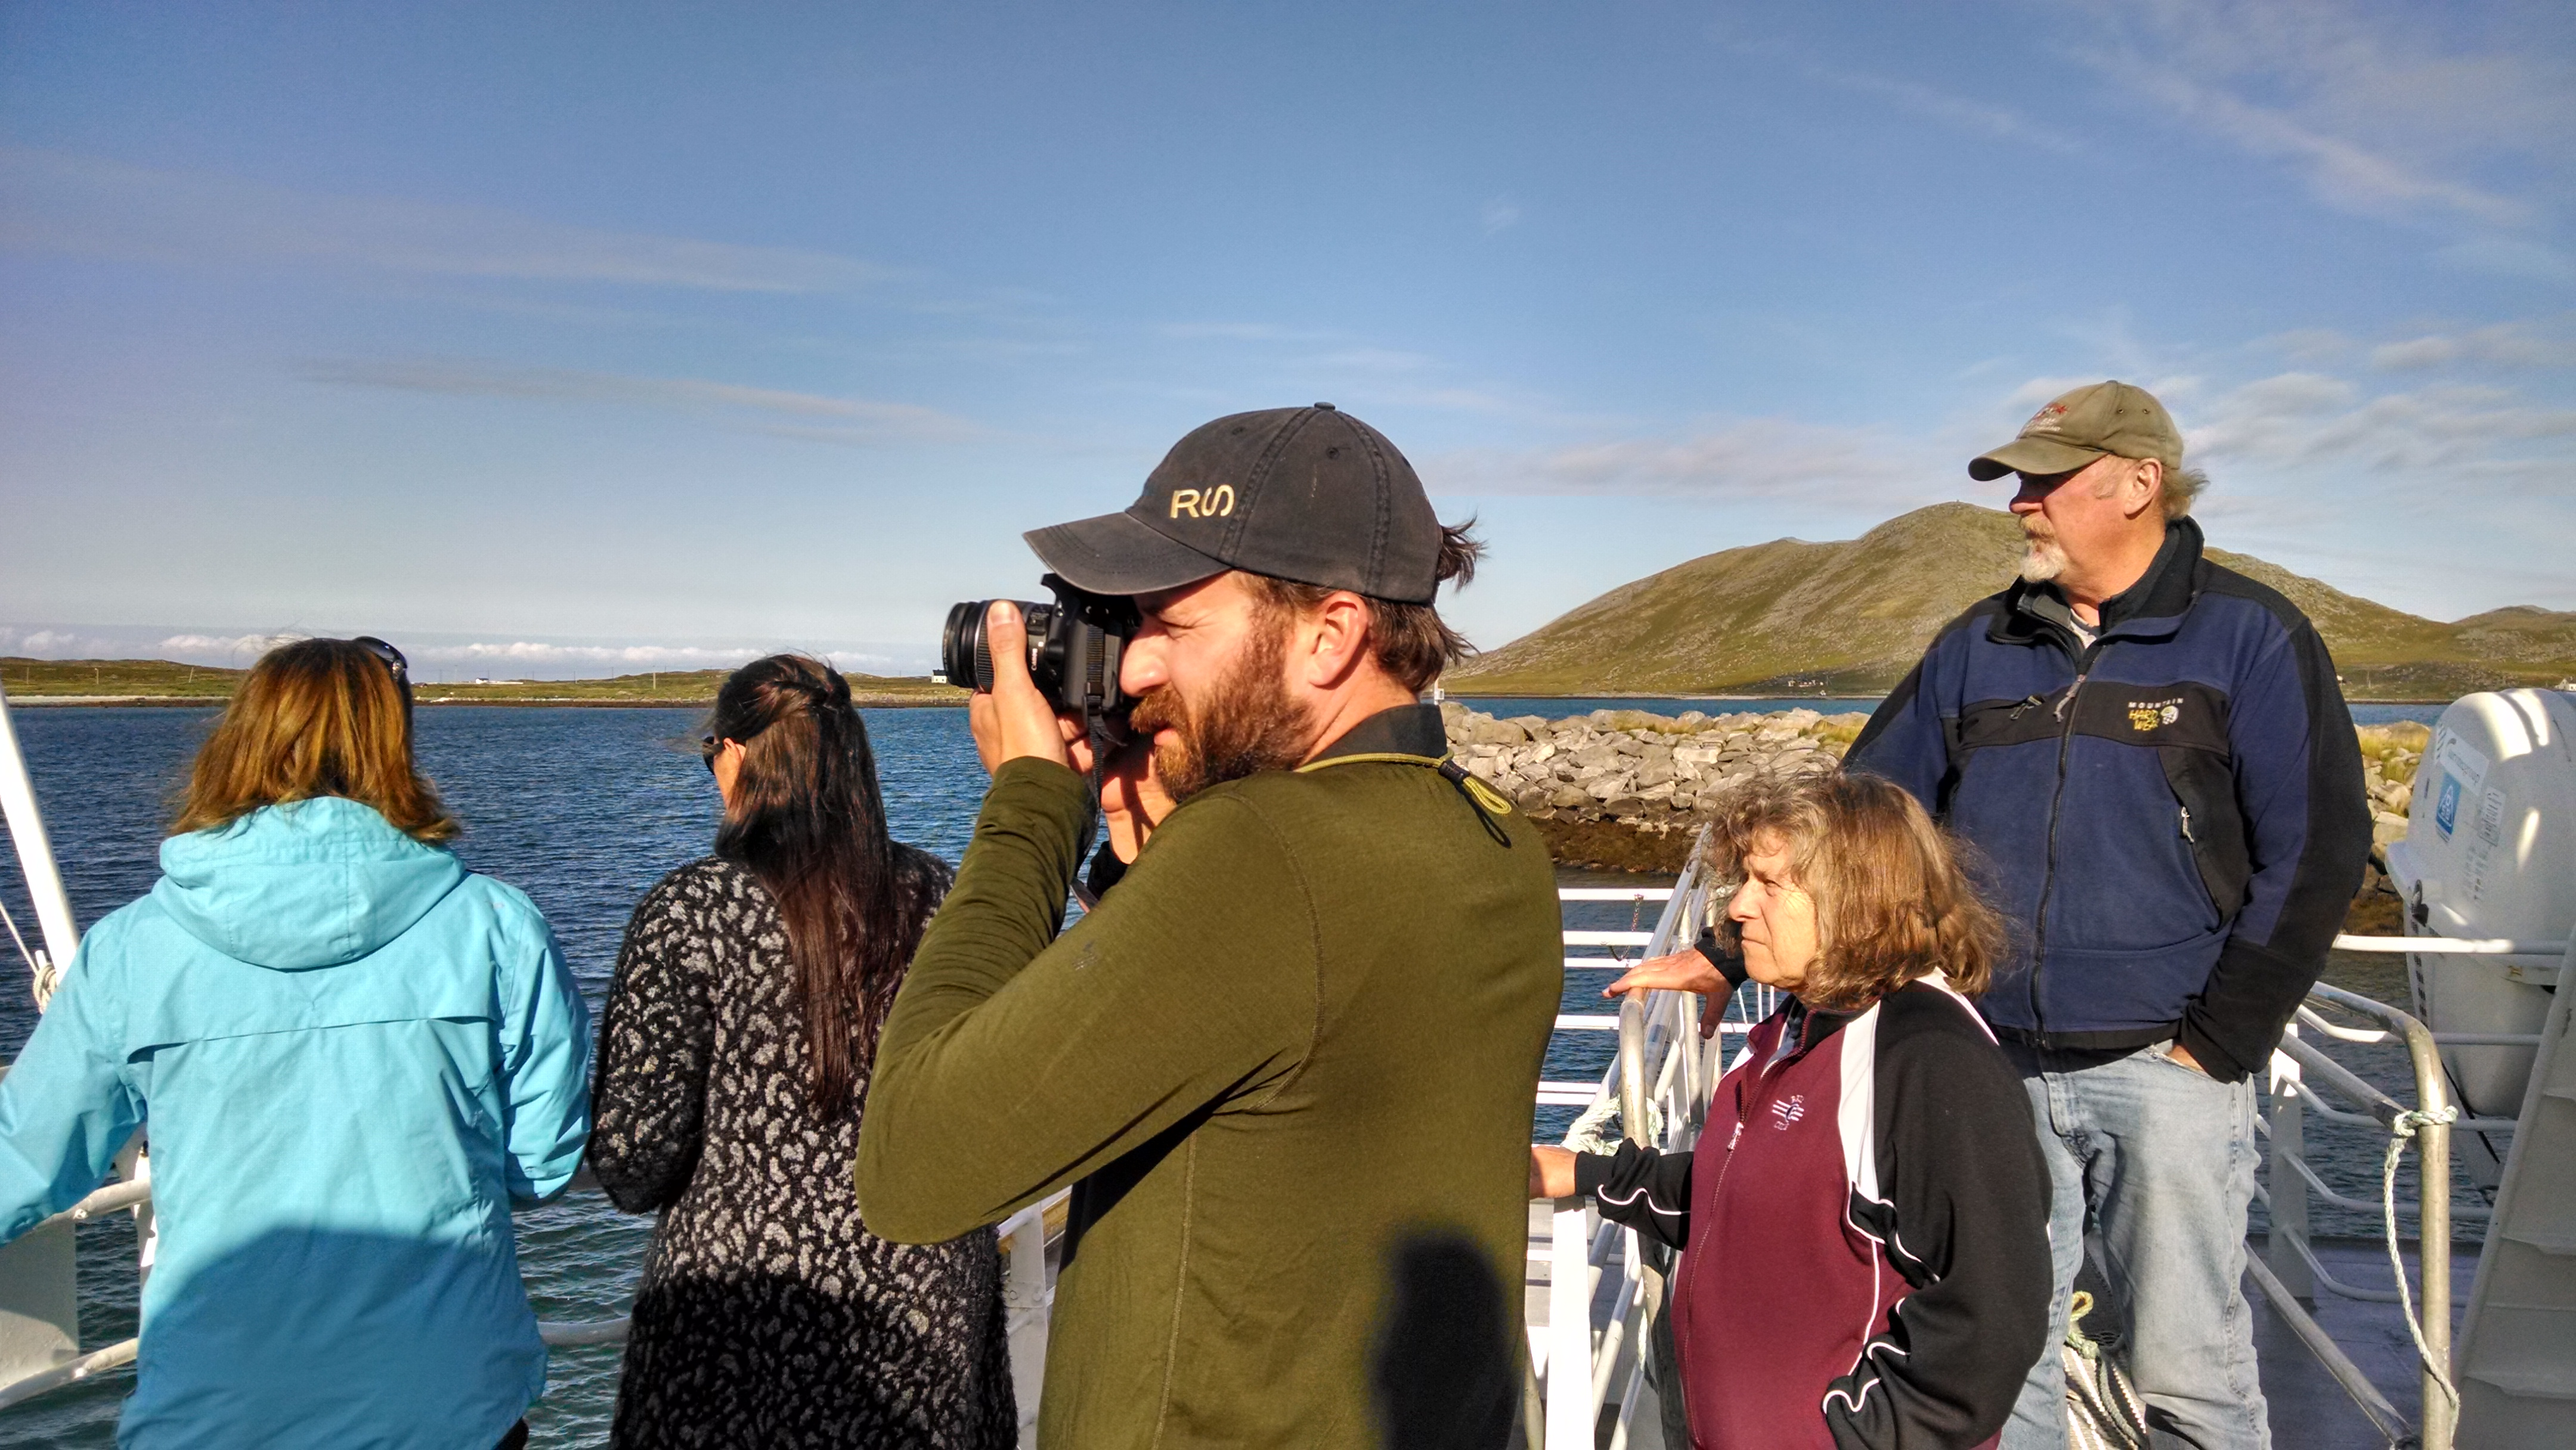 Dan takes some shots en route to Ingøy